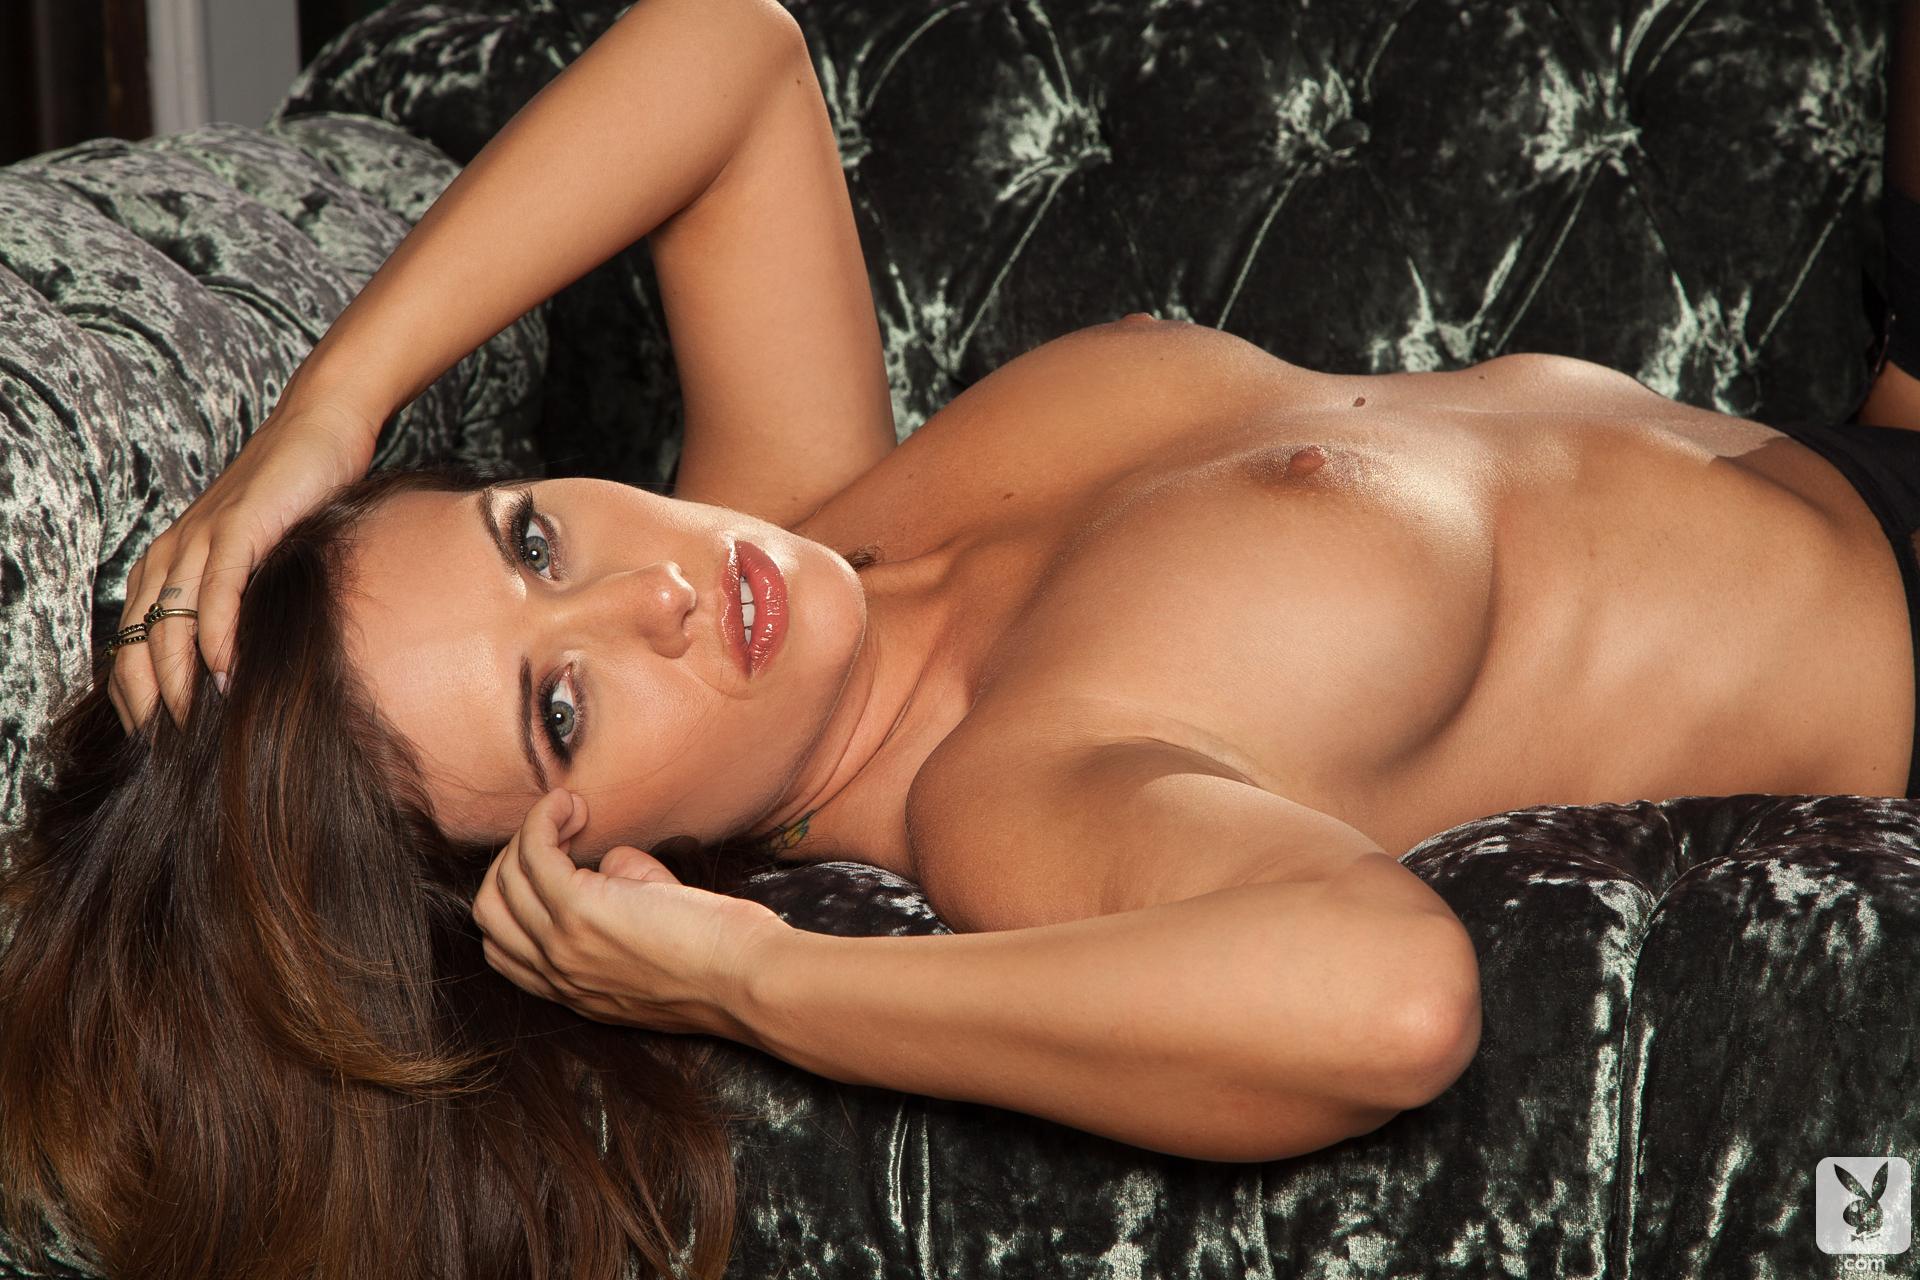 Carlie christine naked pics, rhona mitra nude movies